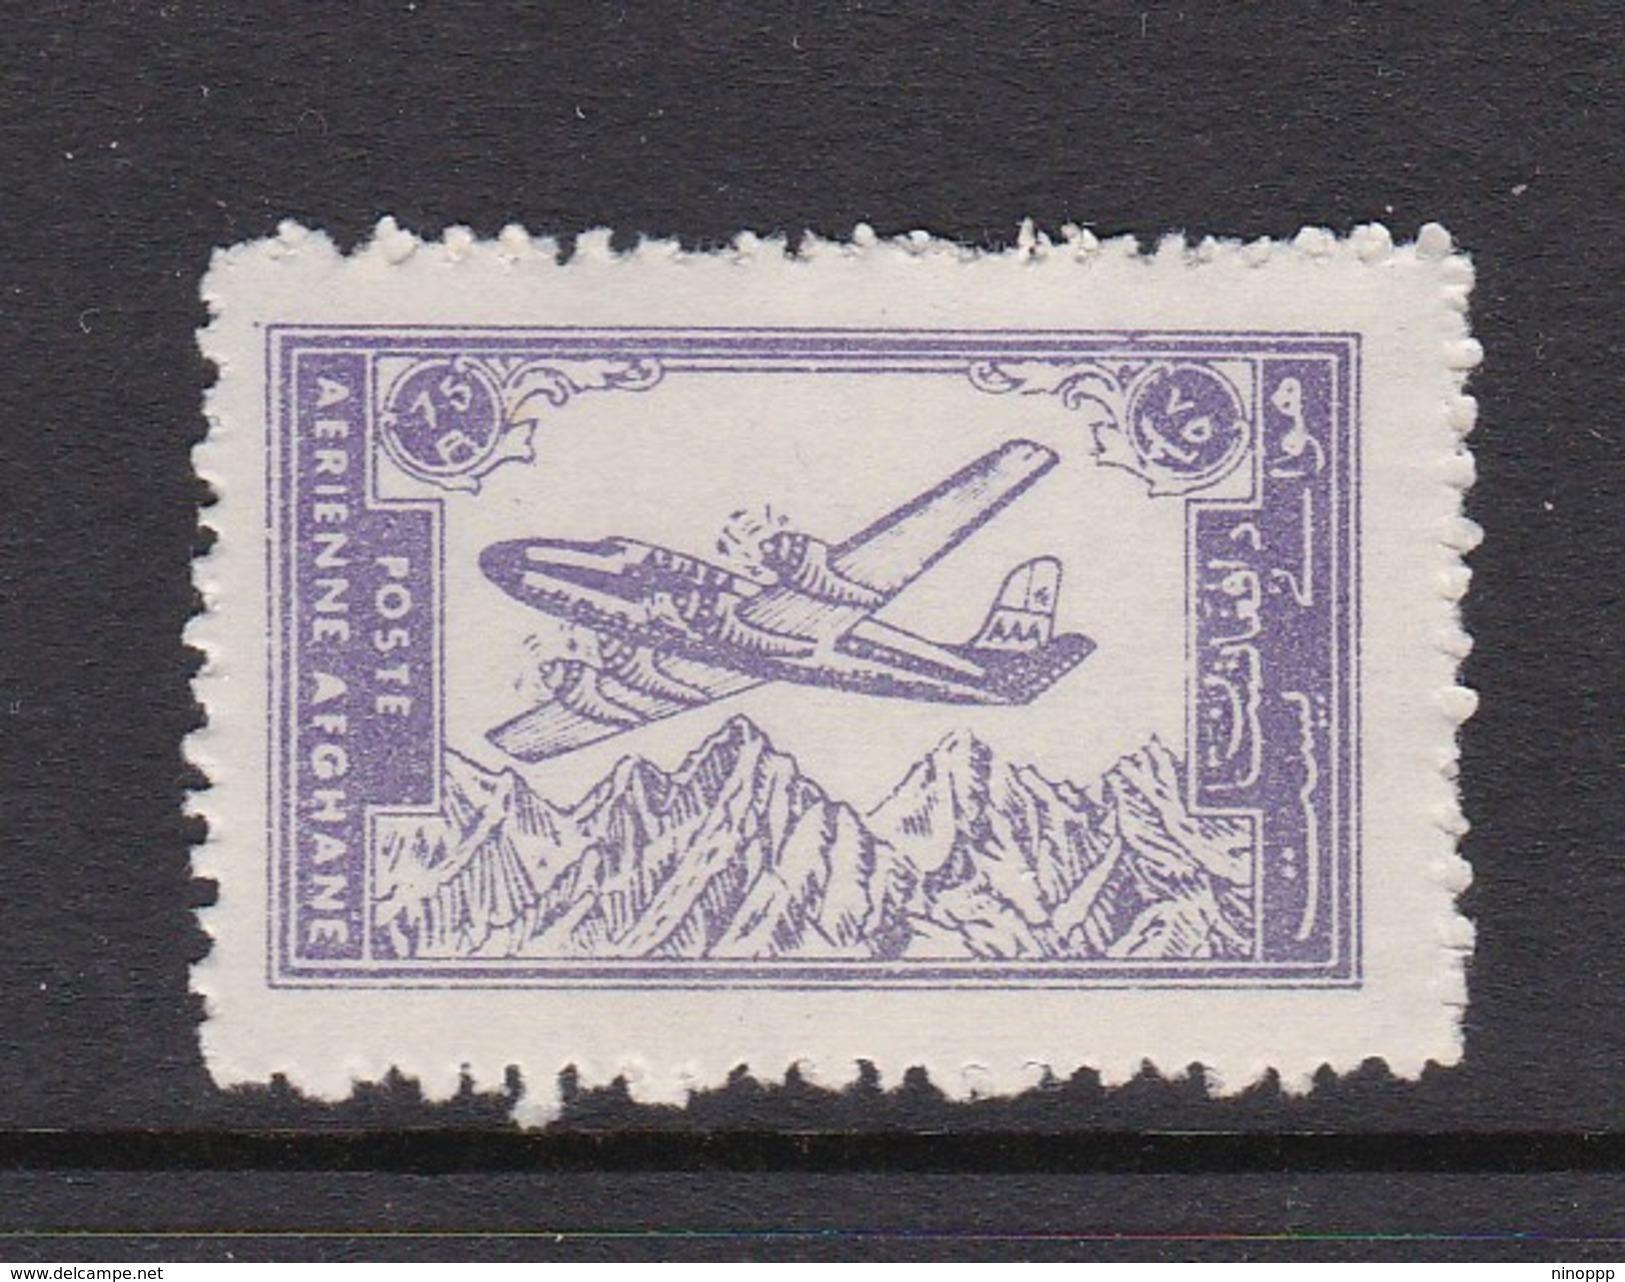 Afghanistan SG 467 1960 Air  Plane 75p Violet MNH - Afghanistan